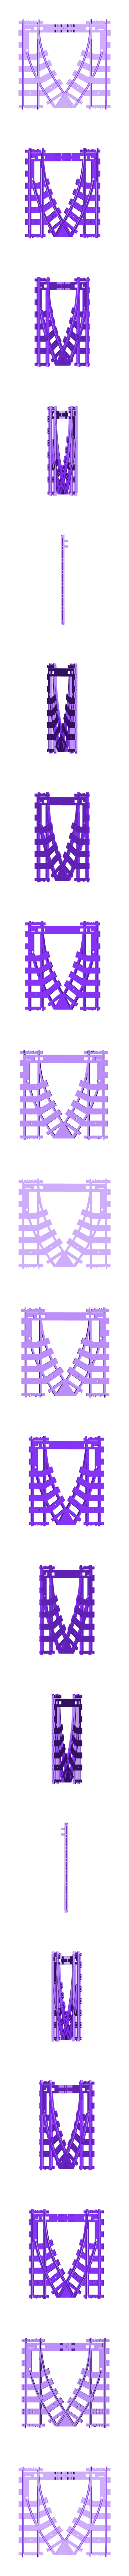 train switch large by ctrl design.stl Télécharger fichier STL large train track switch • Modèle pour impression 3D, Byctrldesign